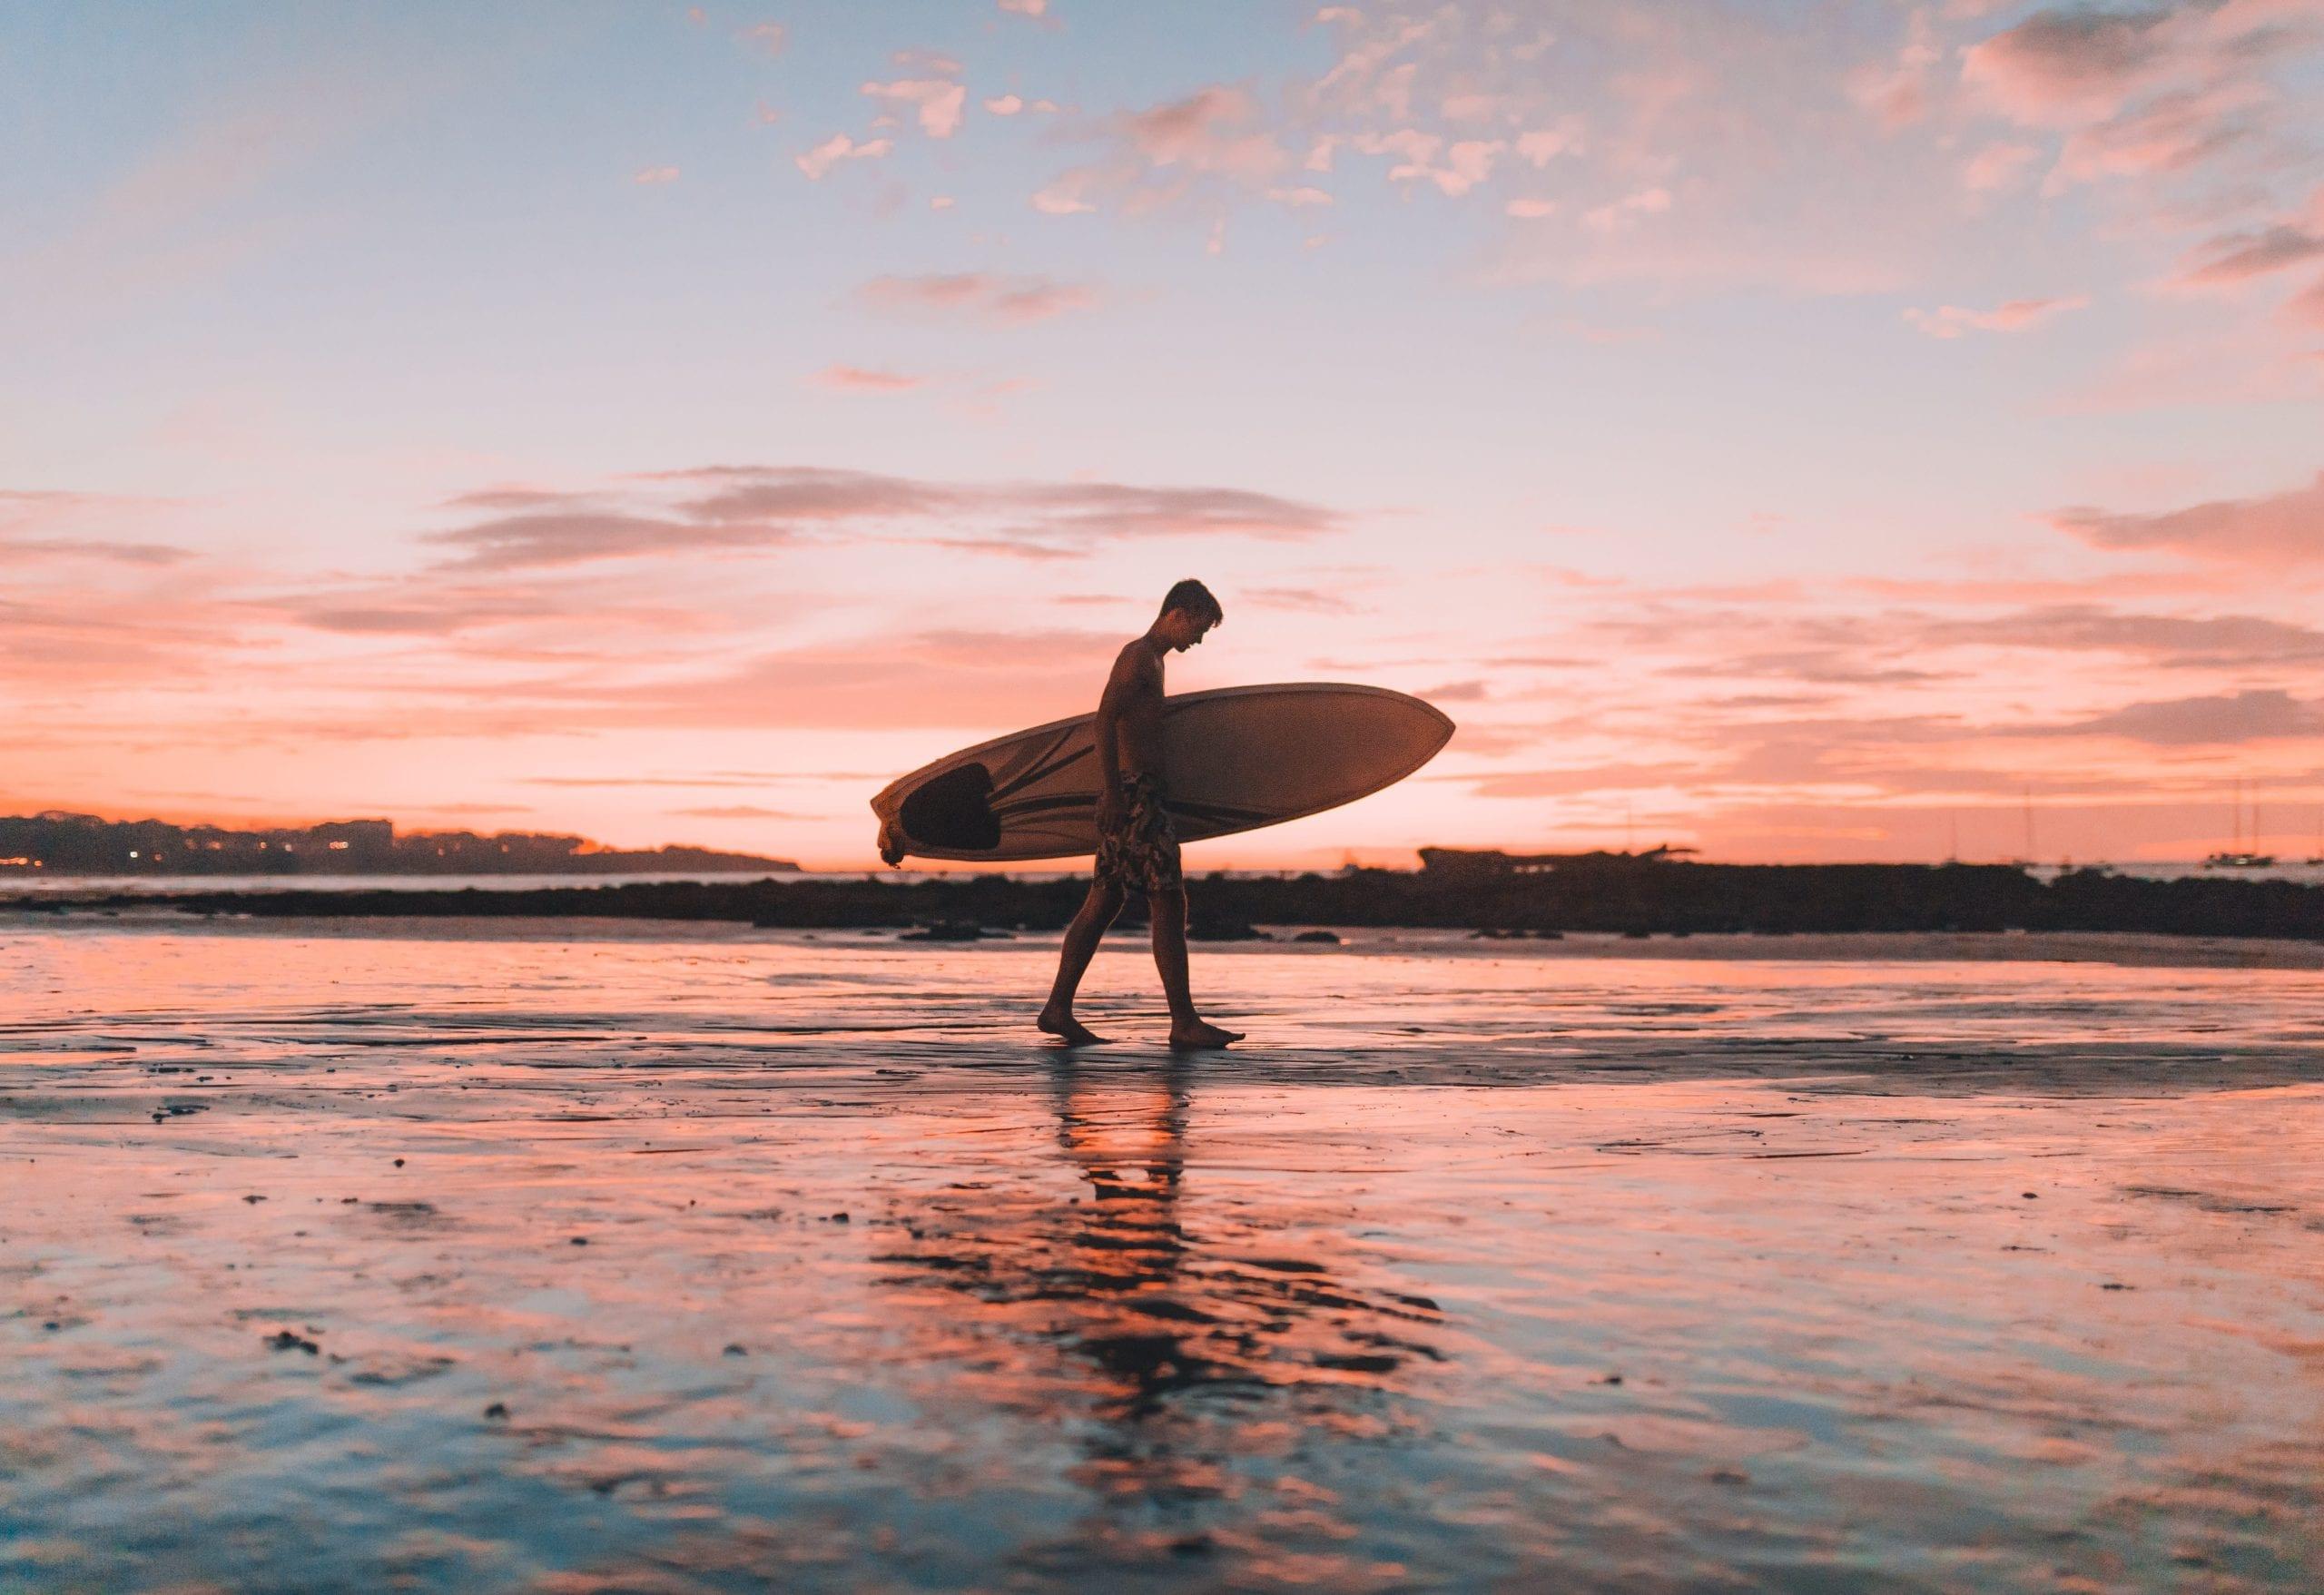 The Top 7 Budget European Surfing Destinations